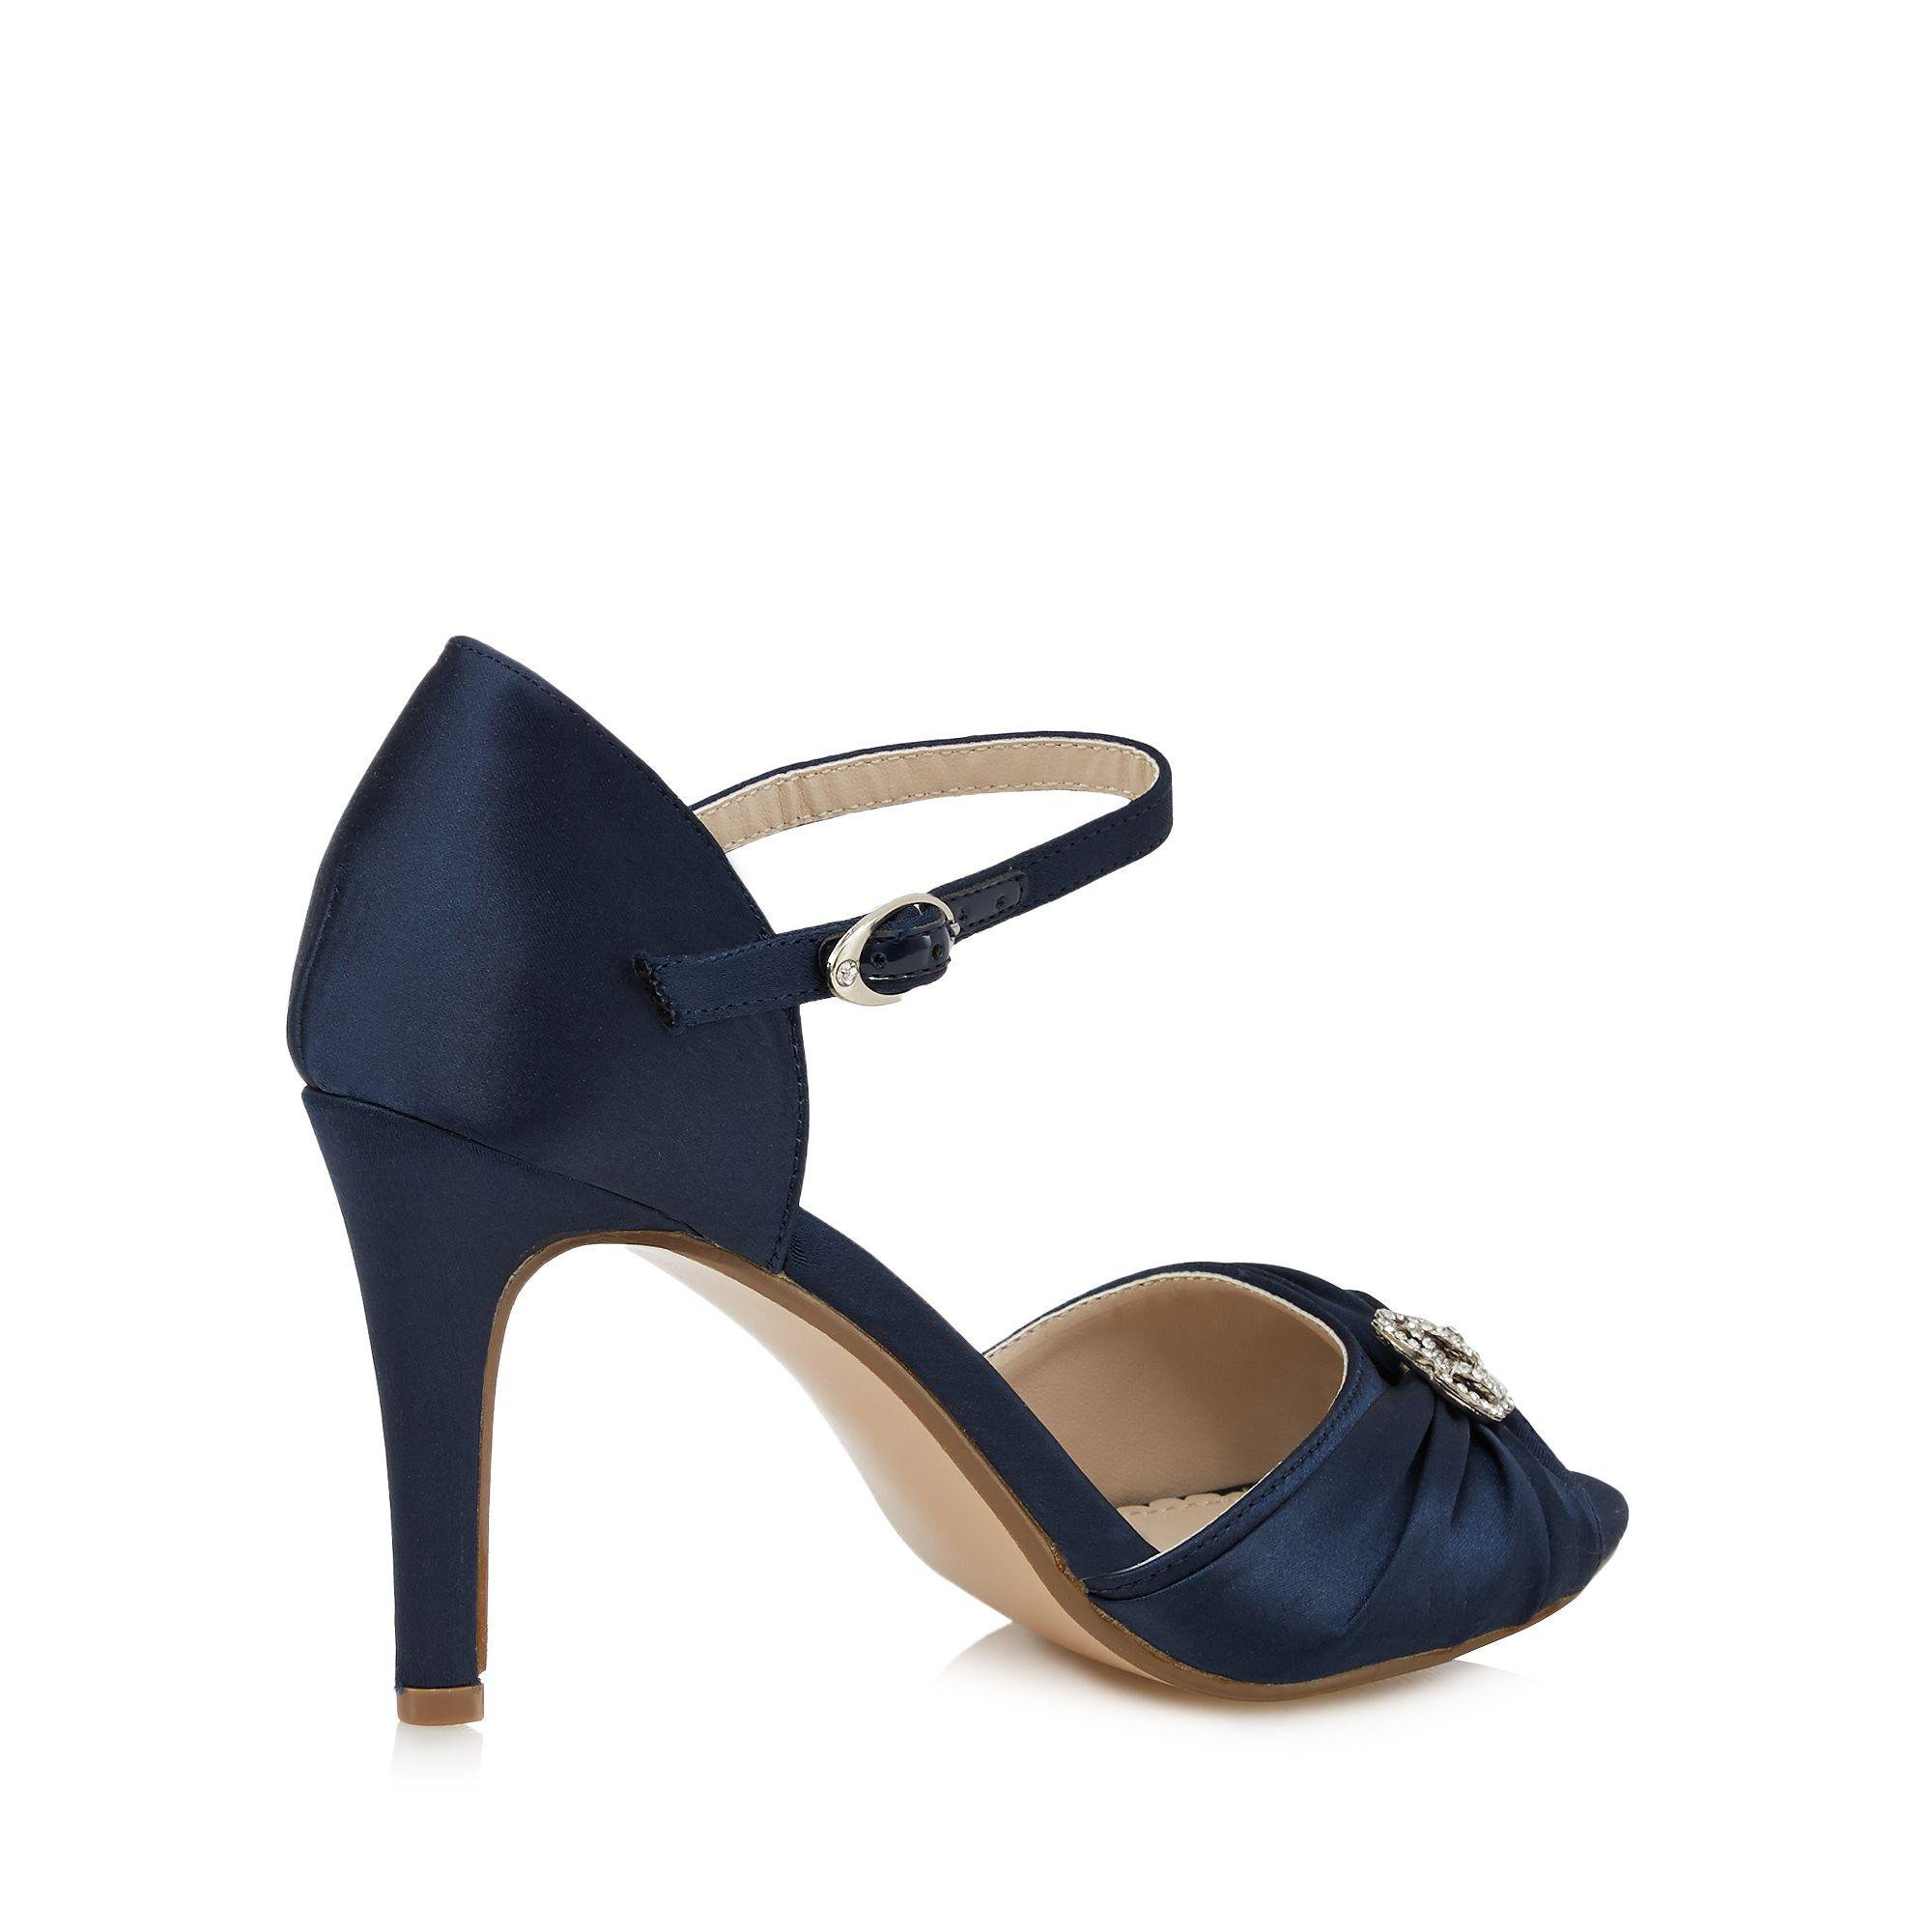 0fa7431f602b Début - Blue Navy High Stiletto Heel Ankle Strap Sandals - Lyst. View  Fullscreen